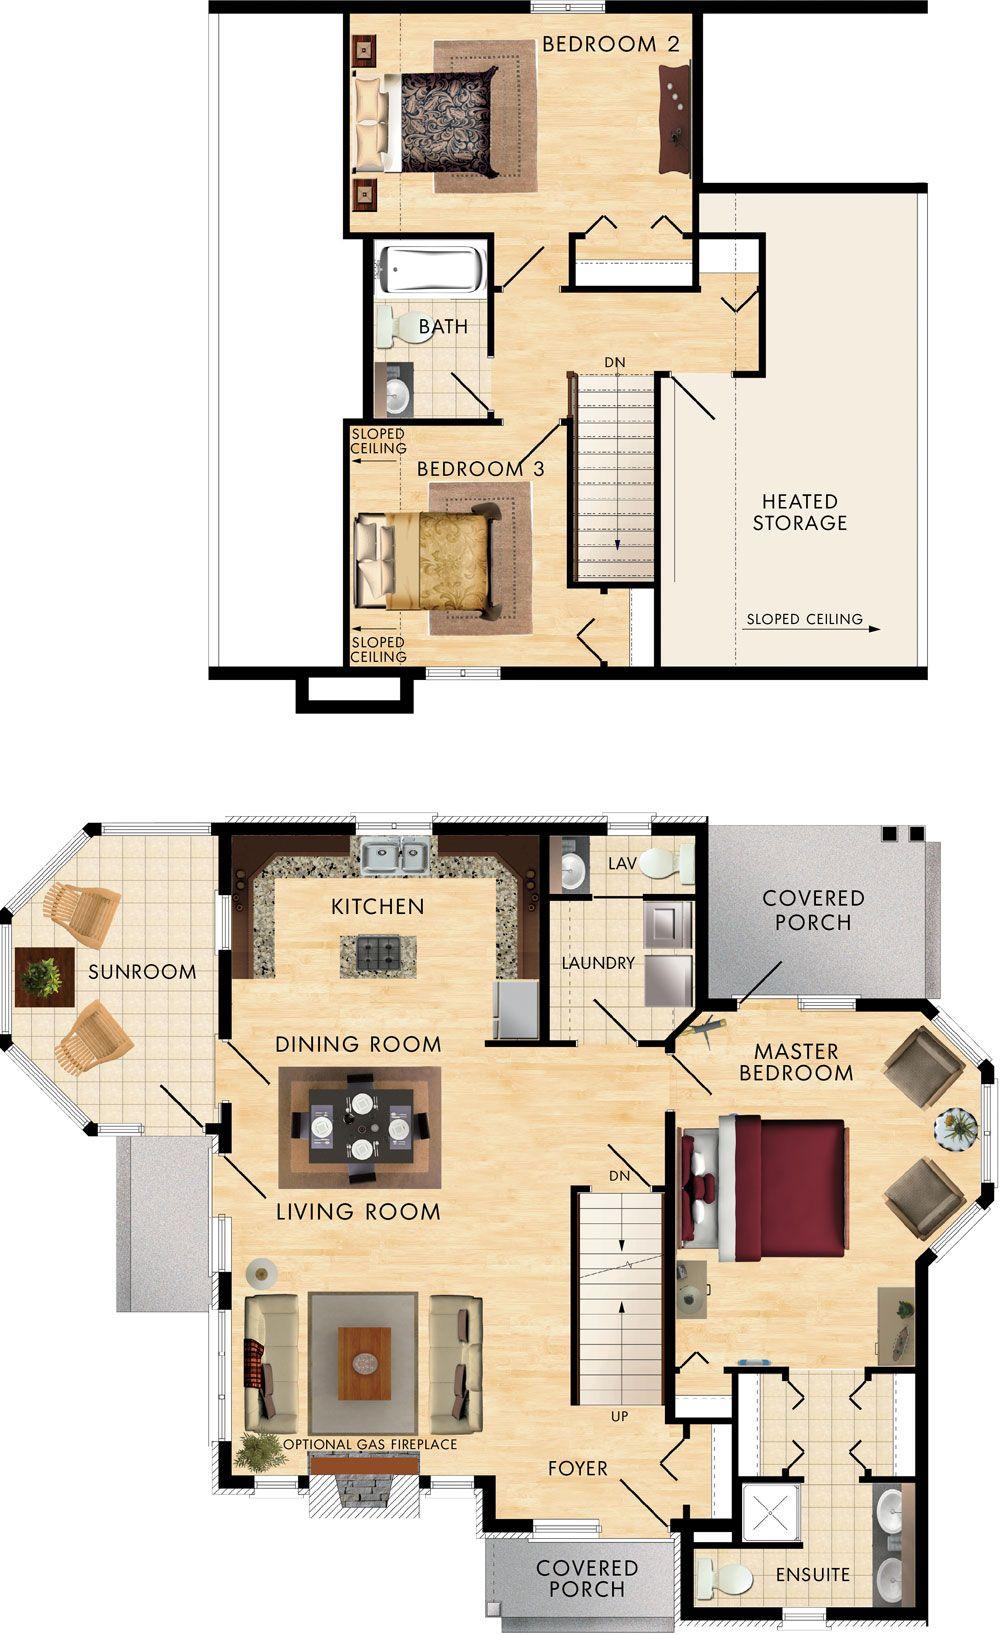 Caldwell cove floor plan get rid of bathroom downstairs make